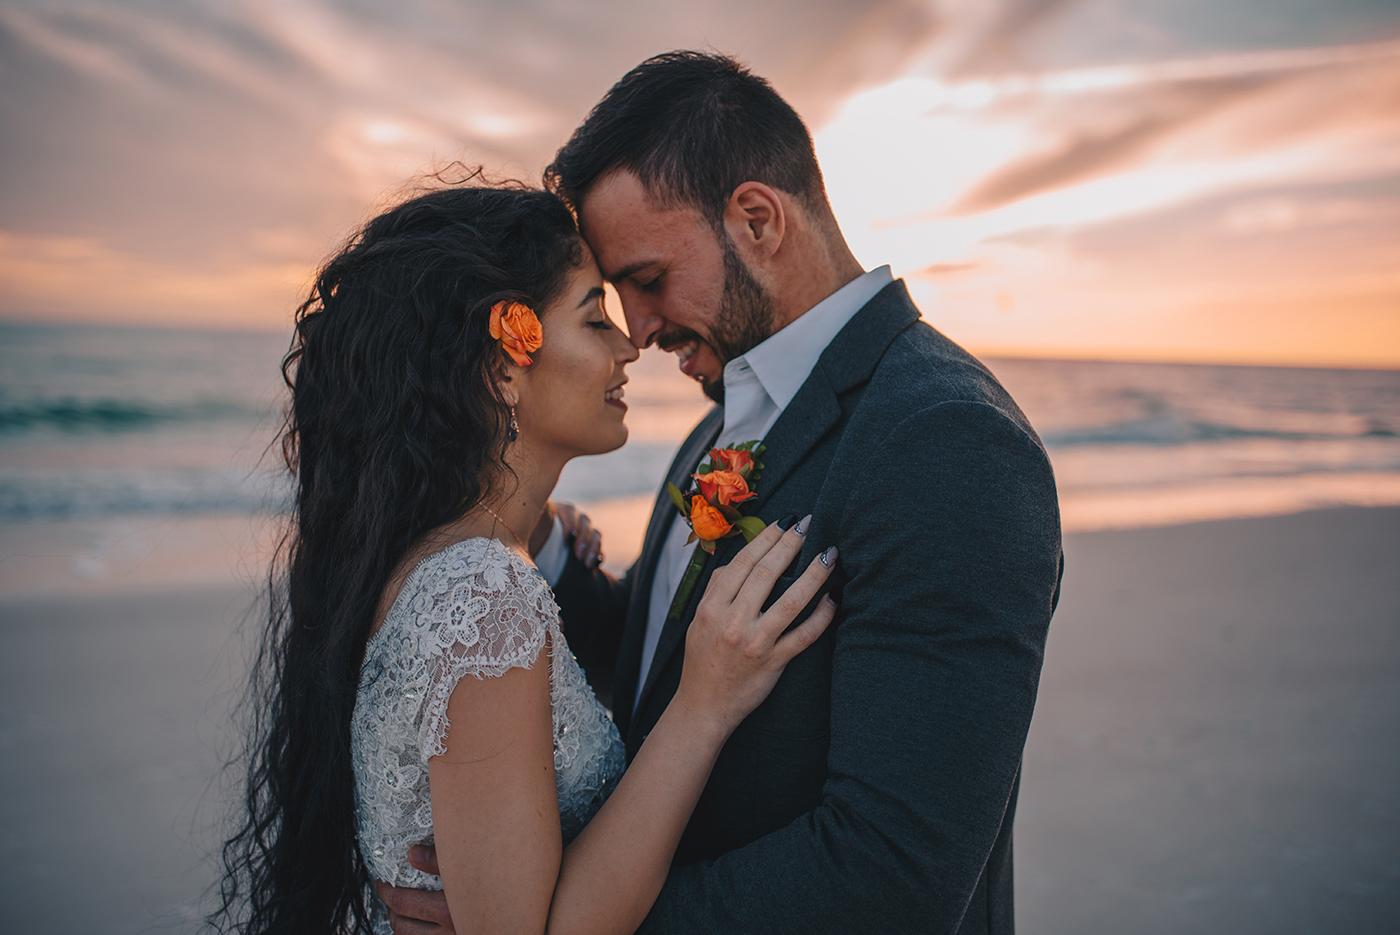 Los-Vargas-Photo-Moana-Wedding-Style-shoot-115.jpg